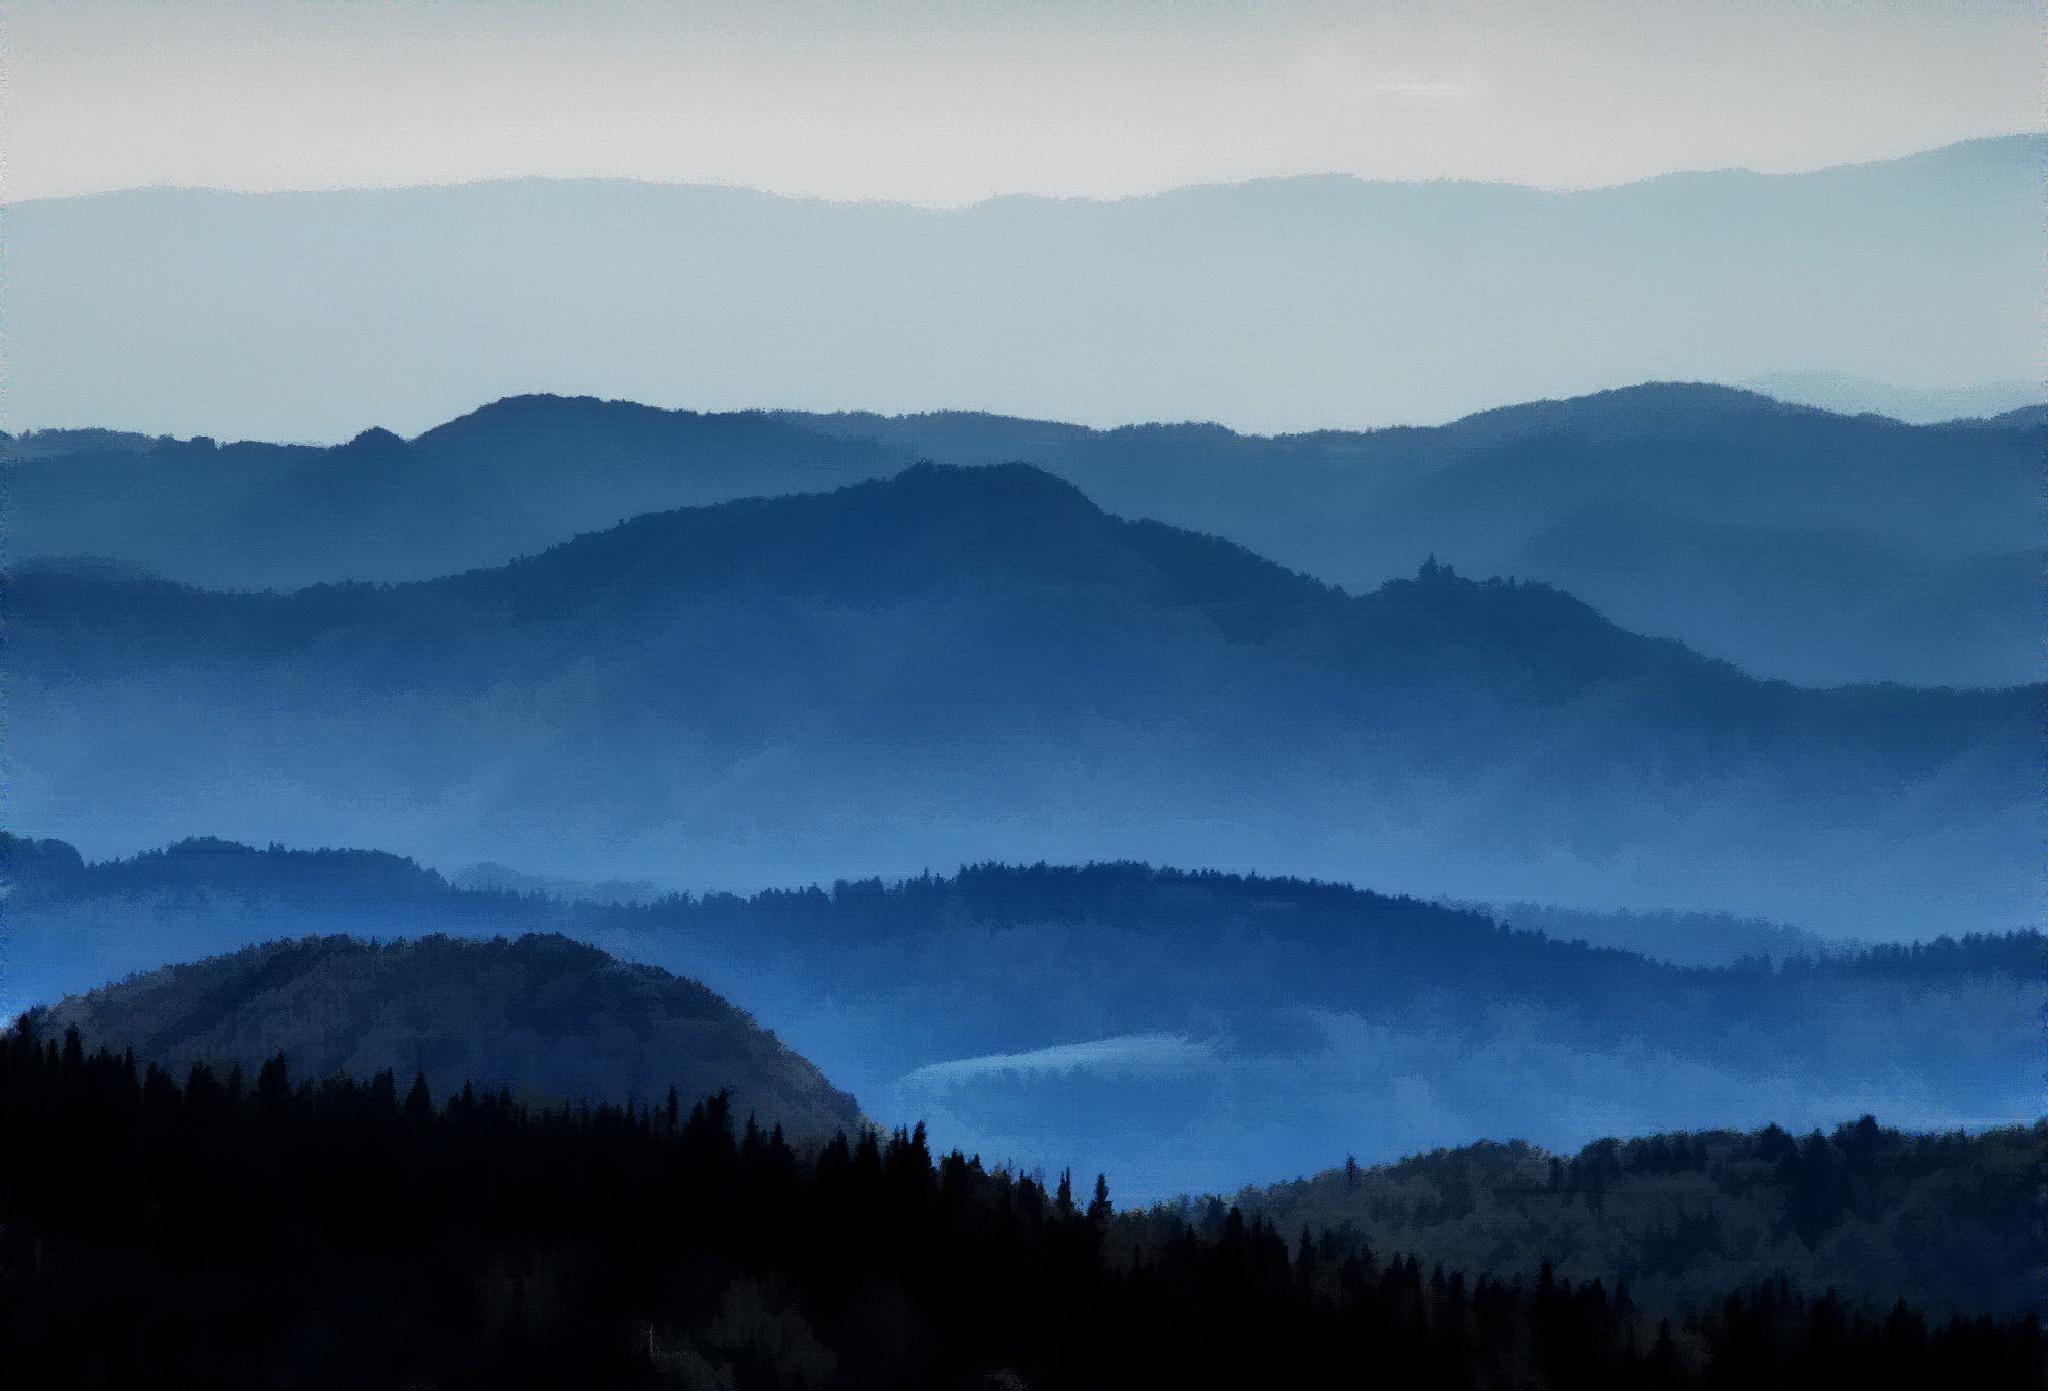 view from the mountain Velika planina, Kamniške Alpe, Slovenia by BernardaBizjak